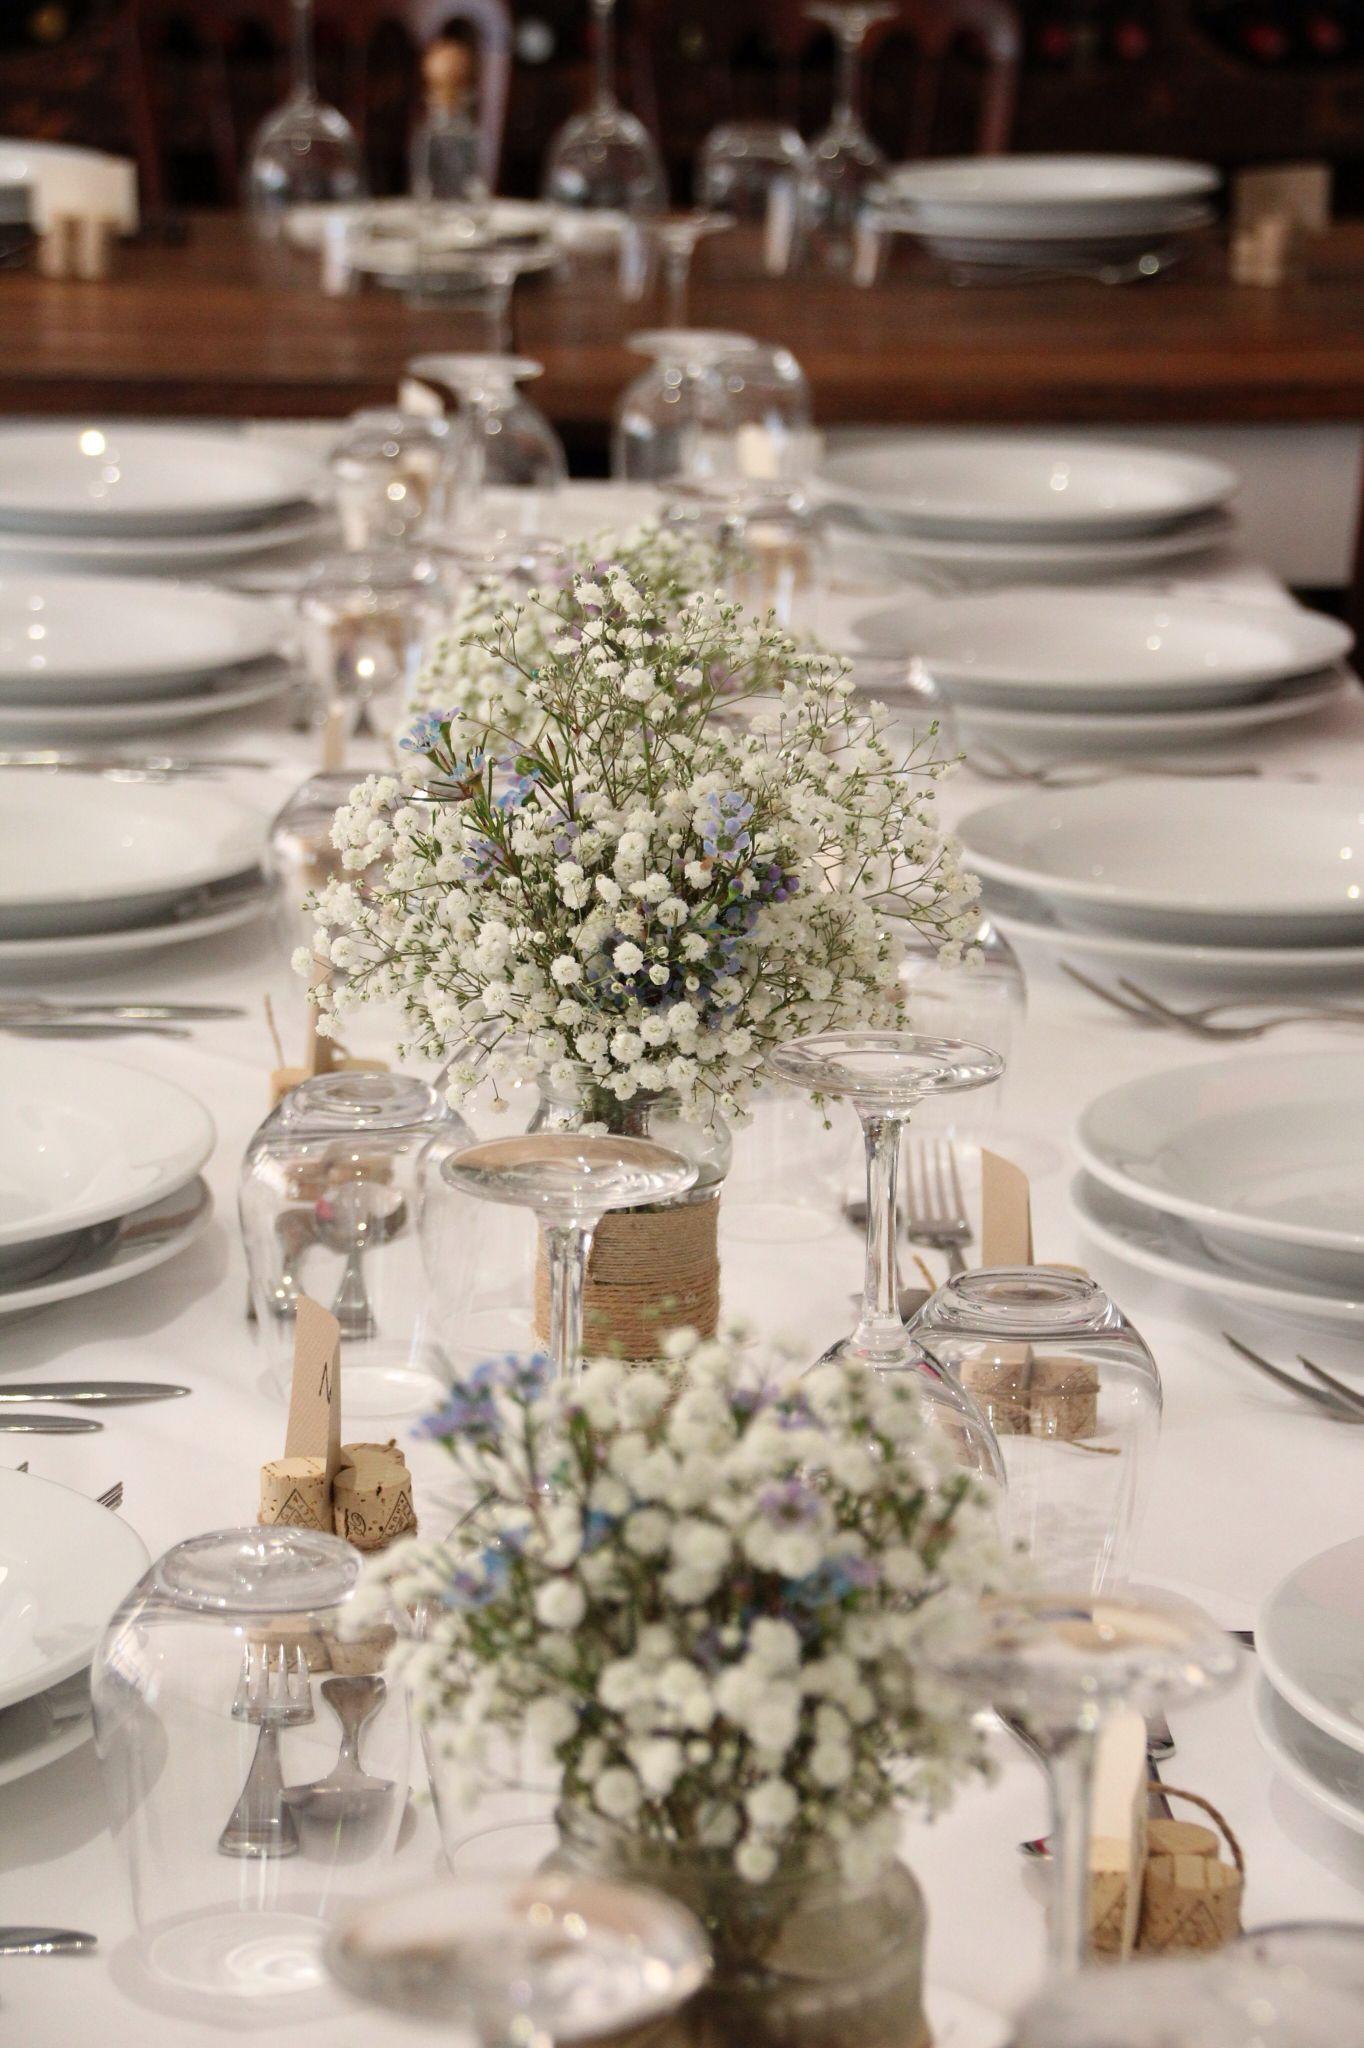 Rustic wedding amongst the vineyards simple styling with Babies breath & wax flower in mason jars rusticwedding